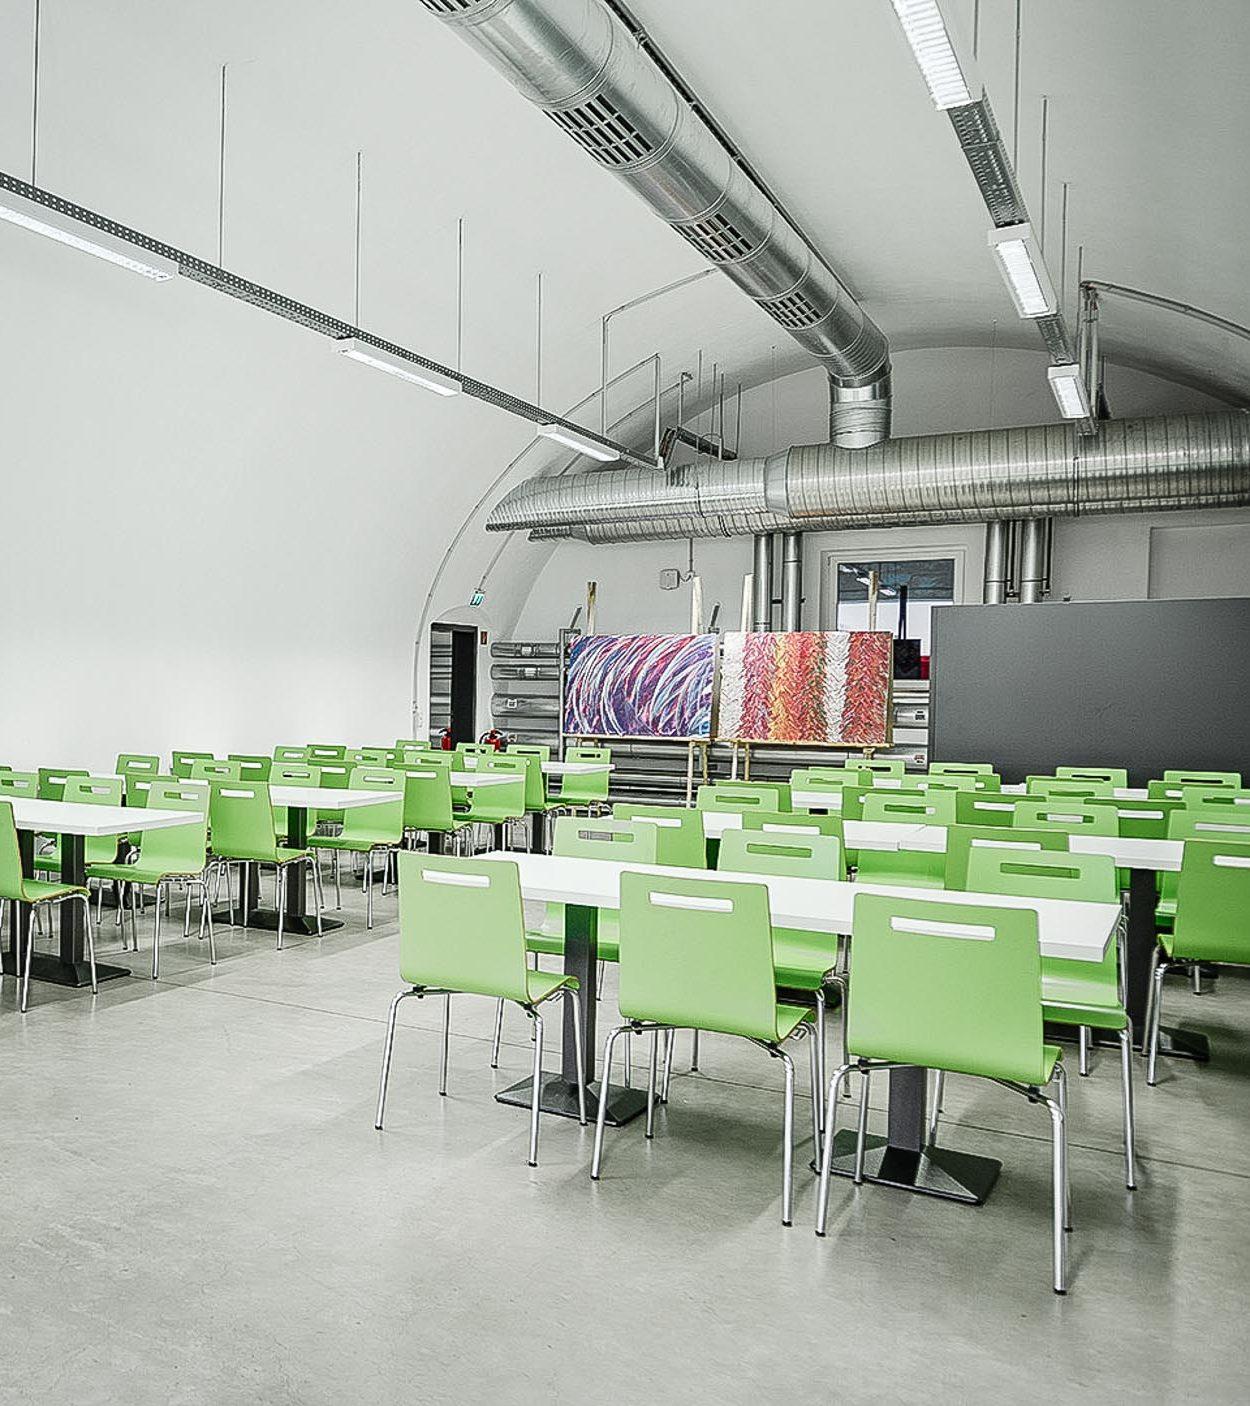 Hochschule Coburg - Mensa